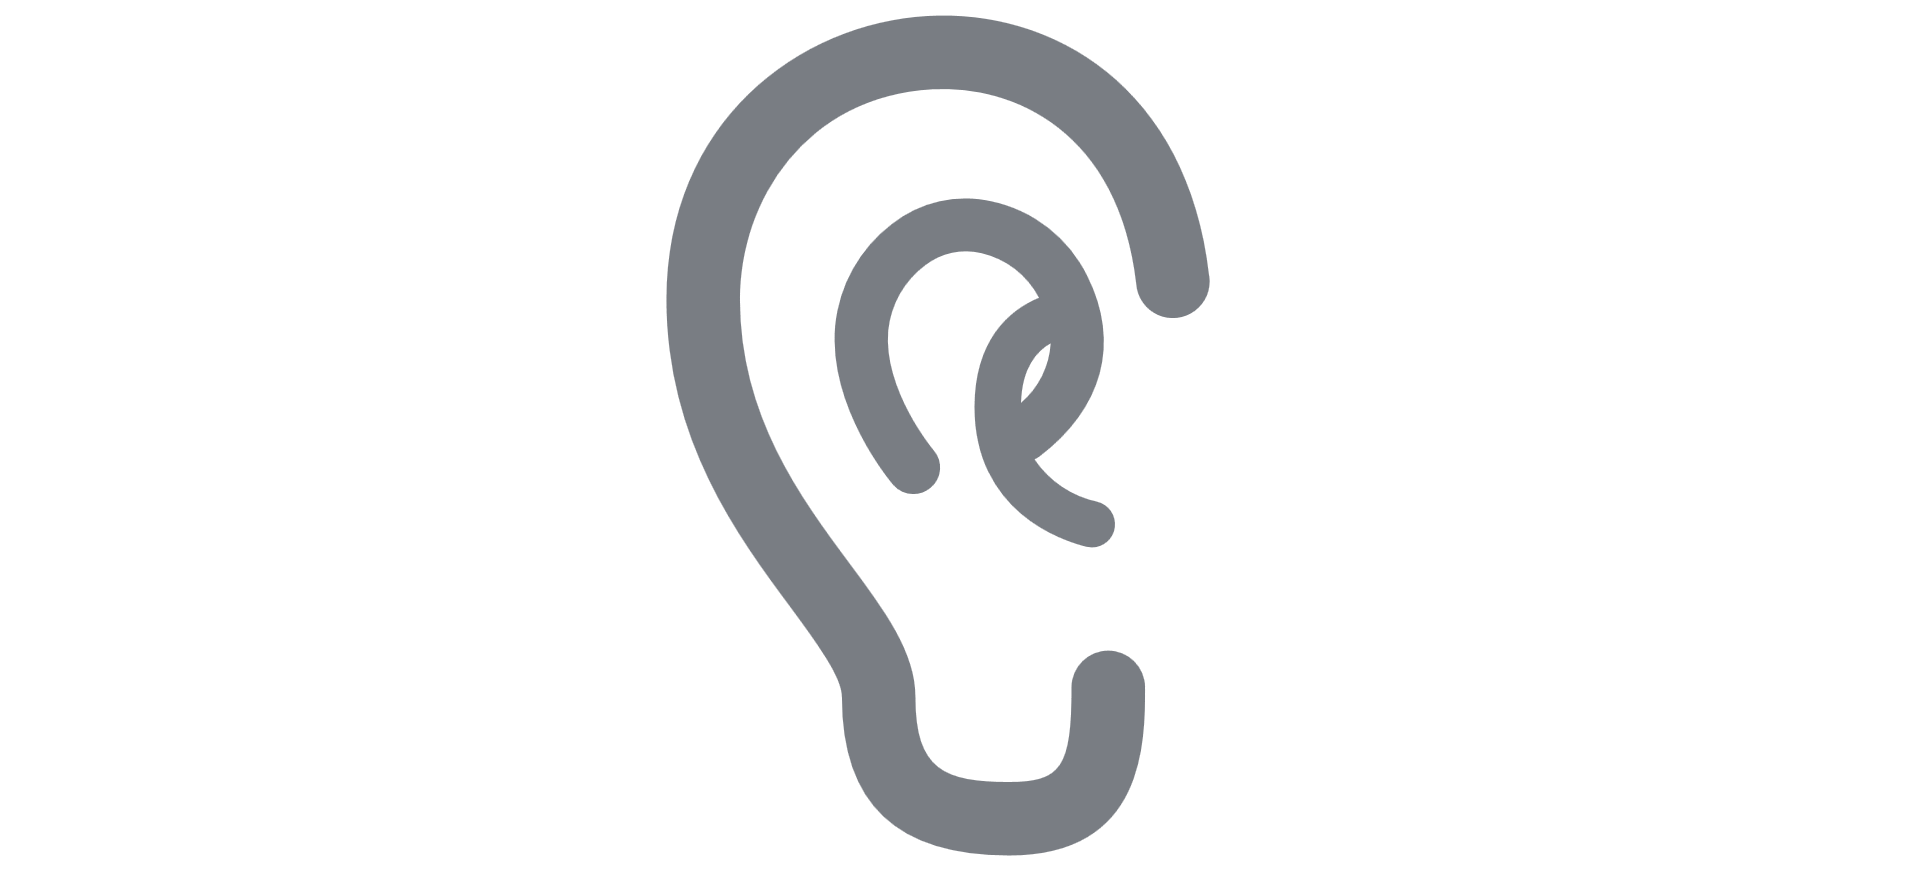 Natural Gas Safety Xcel Energy Garage Door Sensor Wiring Diagram Ear Icon